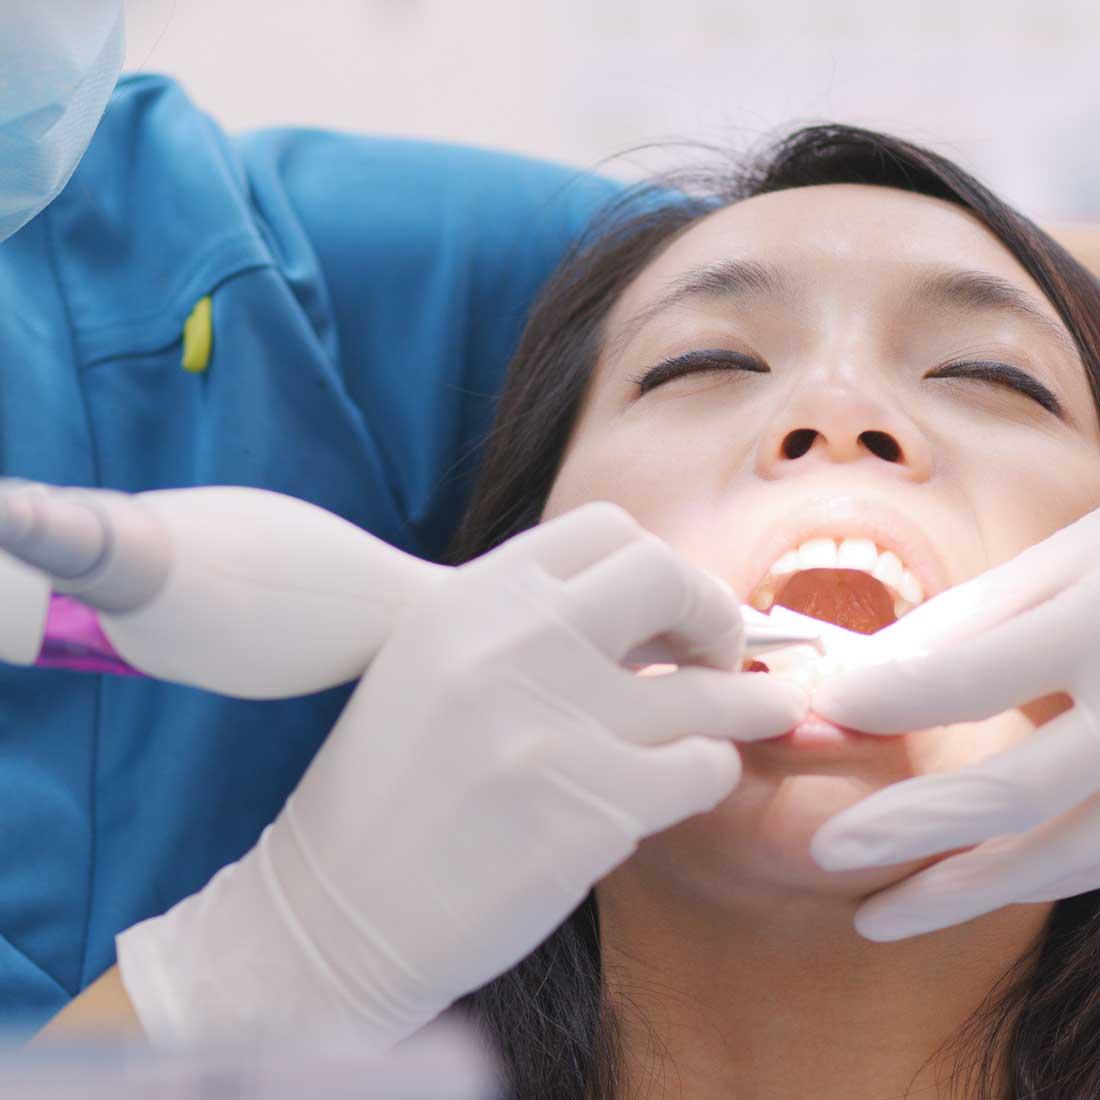 RLJ periodontal treatments